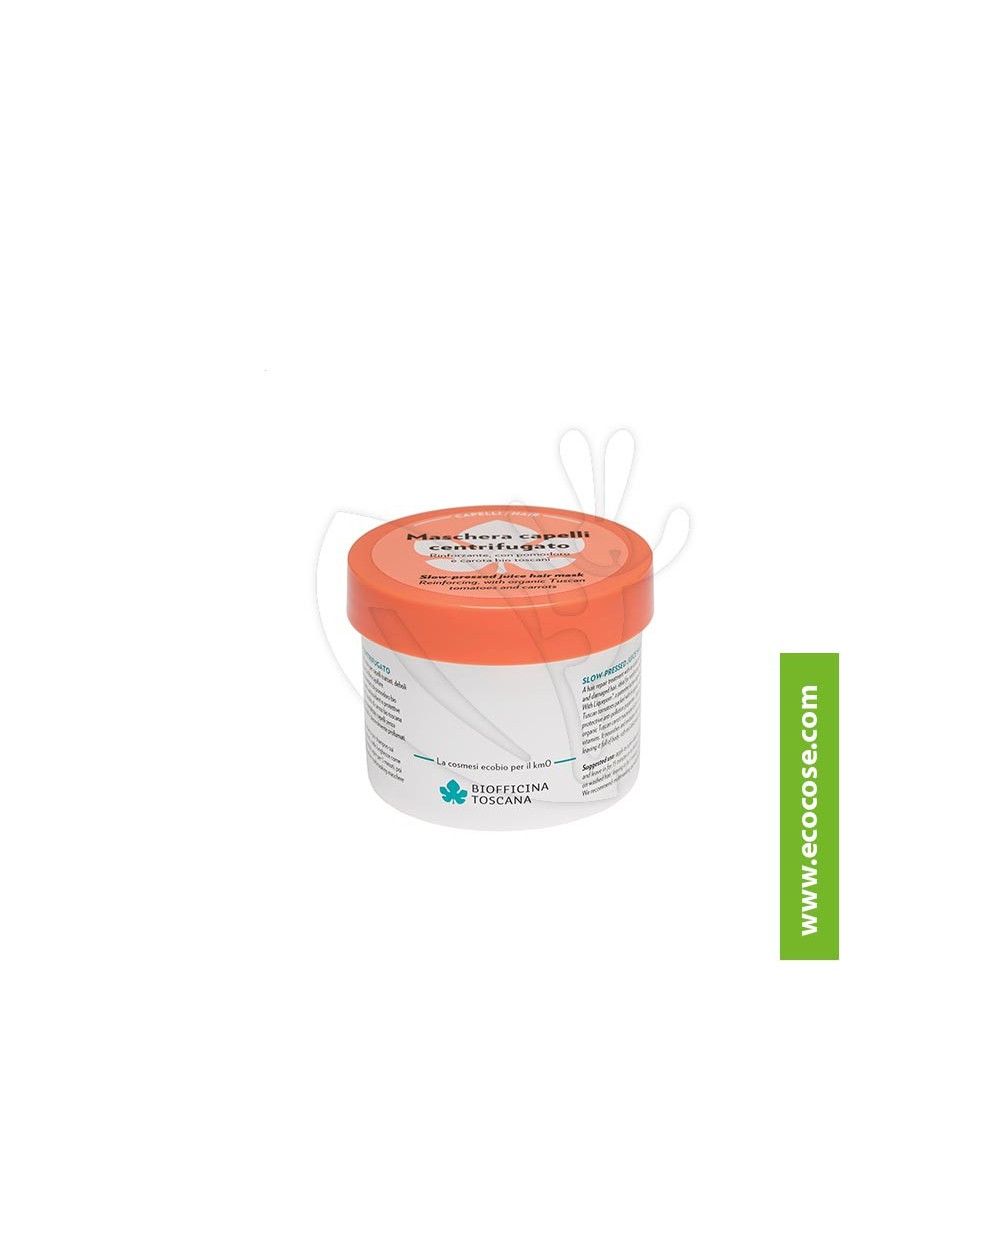 Biofficina Toscana - Maschera capelli centrifugato